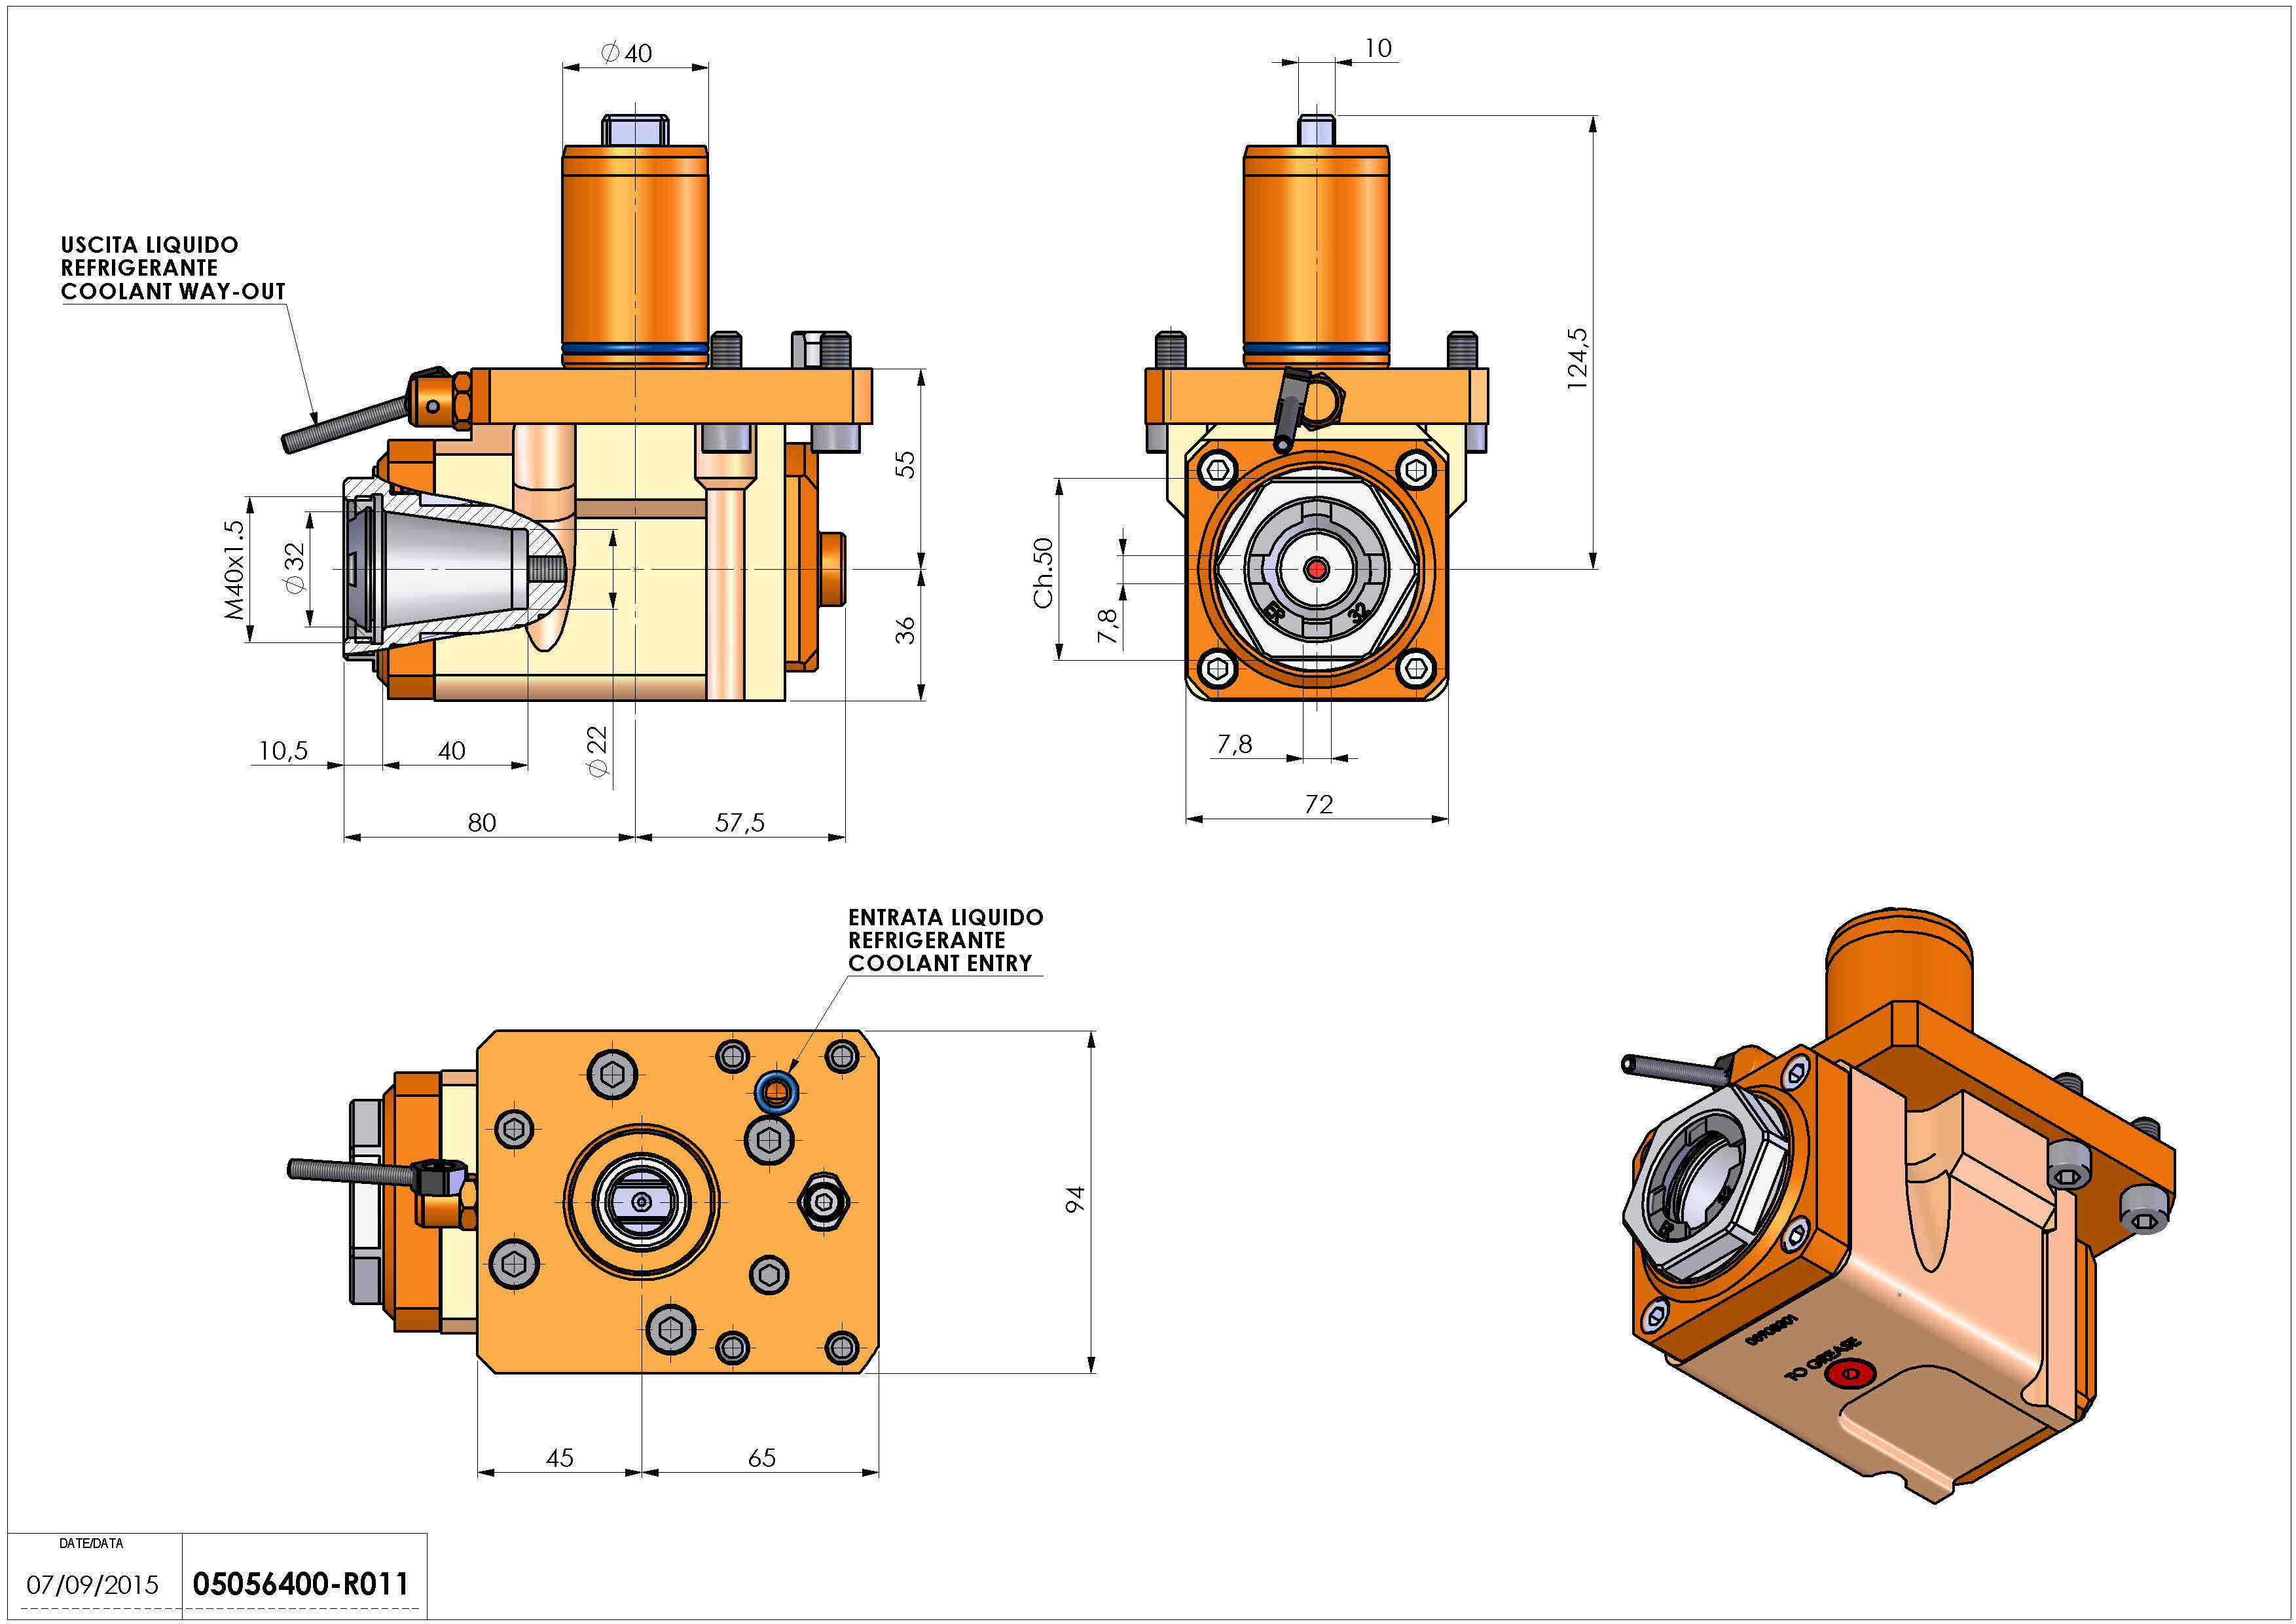 Technical image - LT-A D40 ER32F H55 MZ.